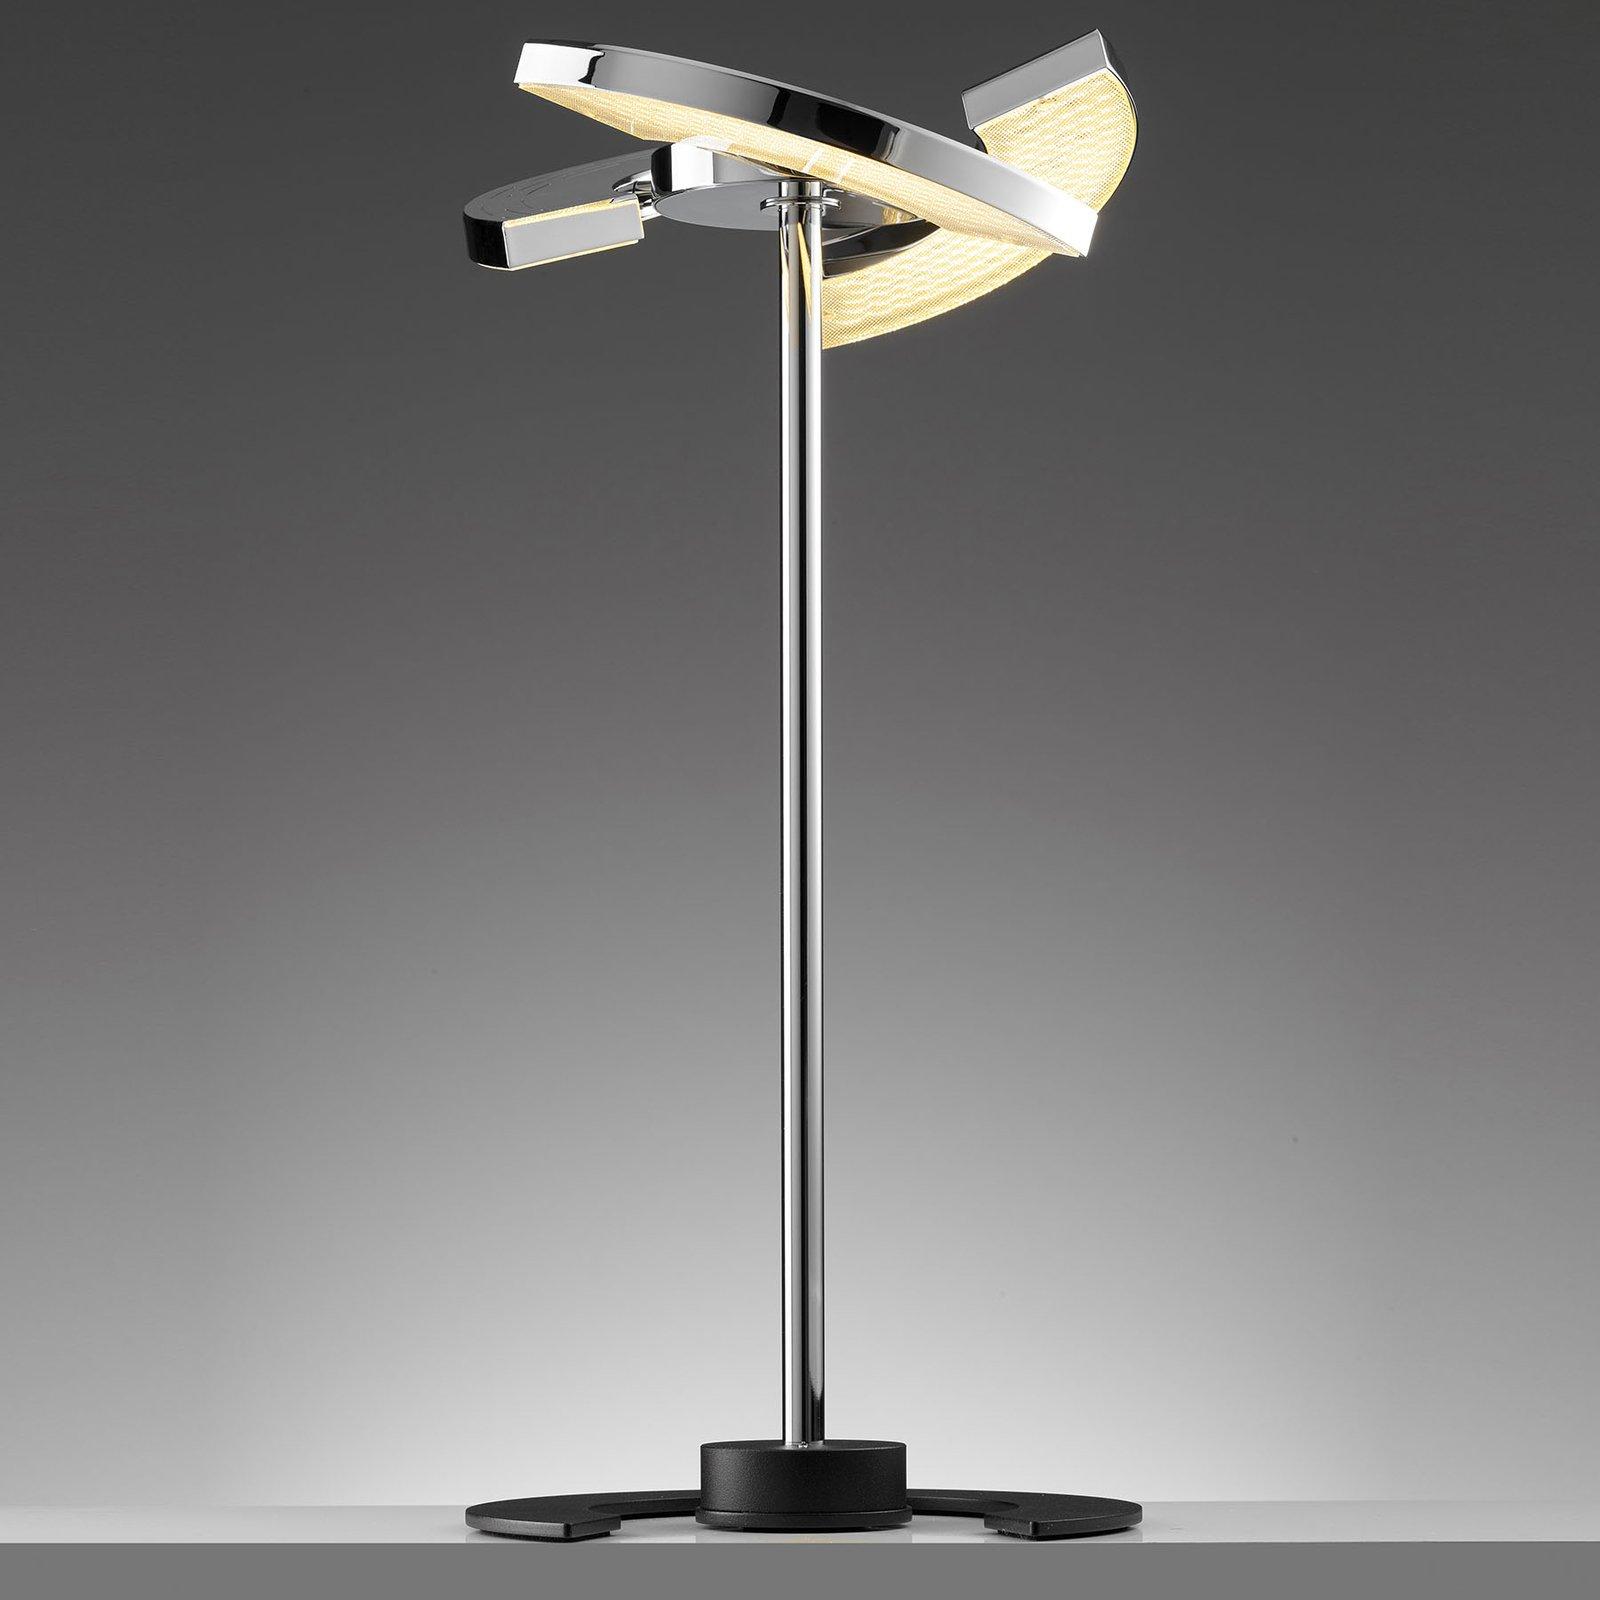 OLIGO Trinity LED-bordlampe, 3 bevegelige segment